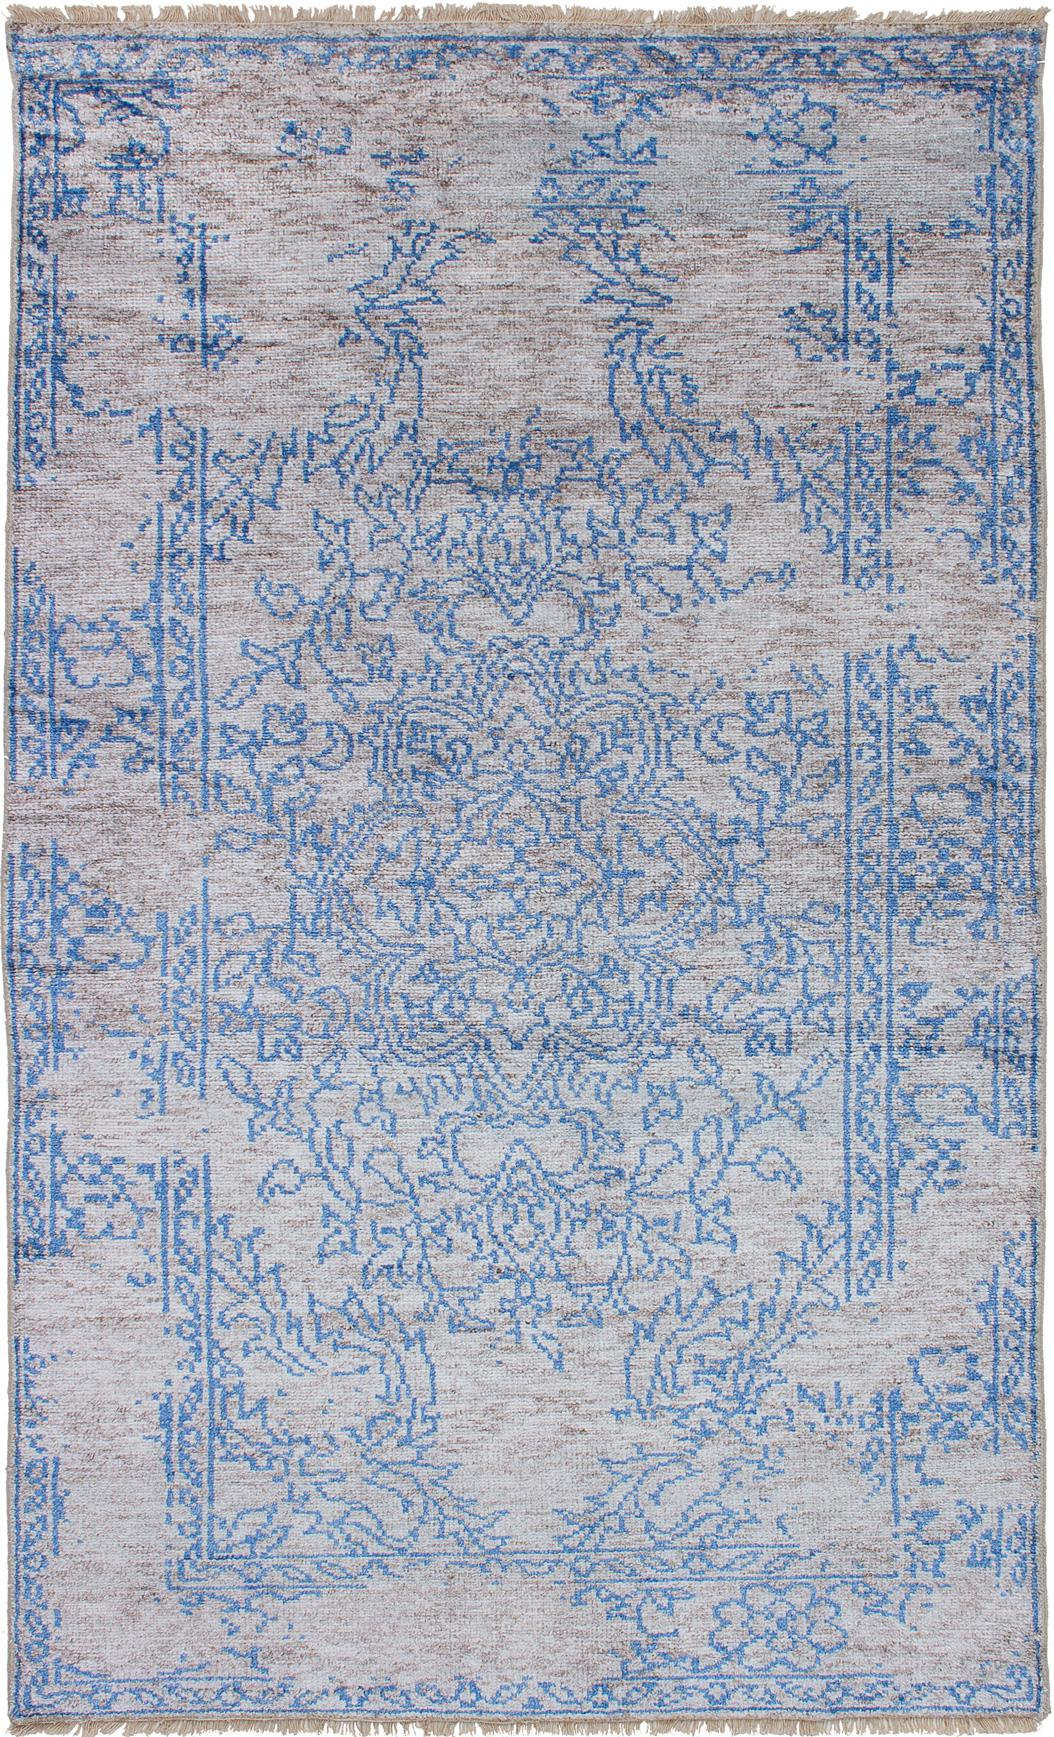 Boho Chic Turkish Gray Blue Handmade Wool Silk Rug 4 10 8